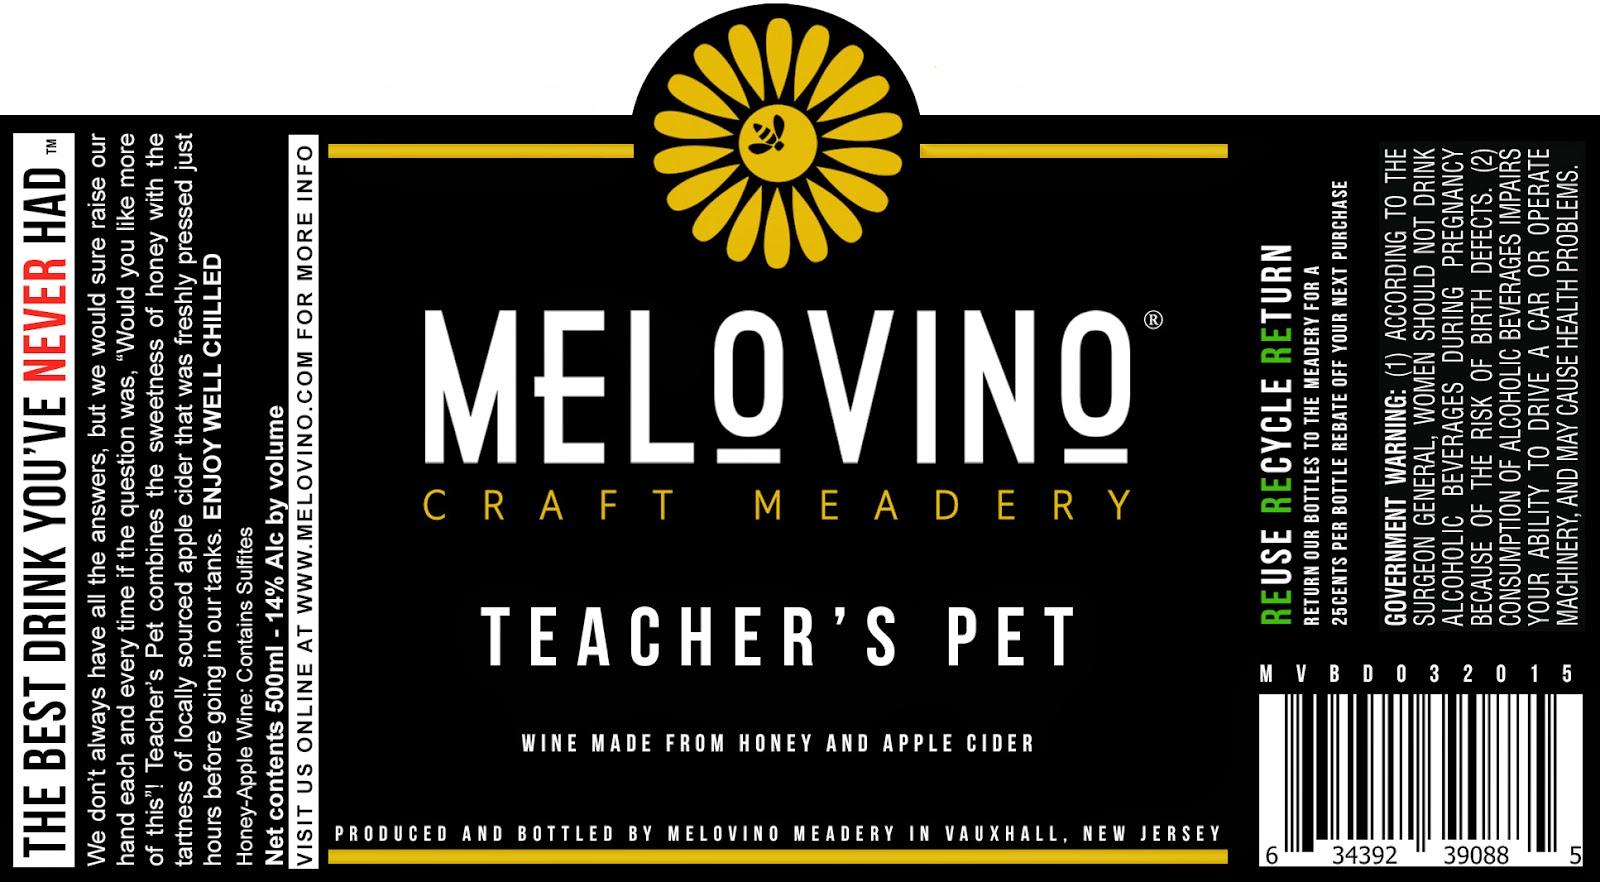 Melovino Meadery, New Jersey, Vauxhall